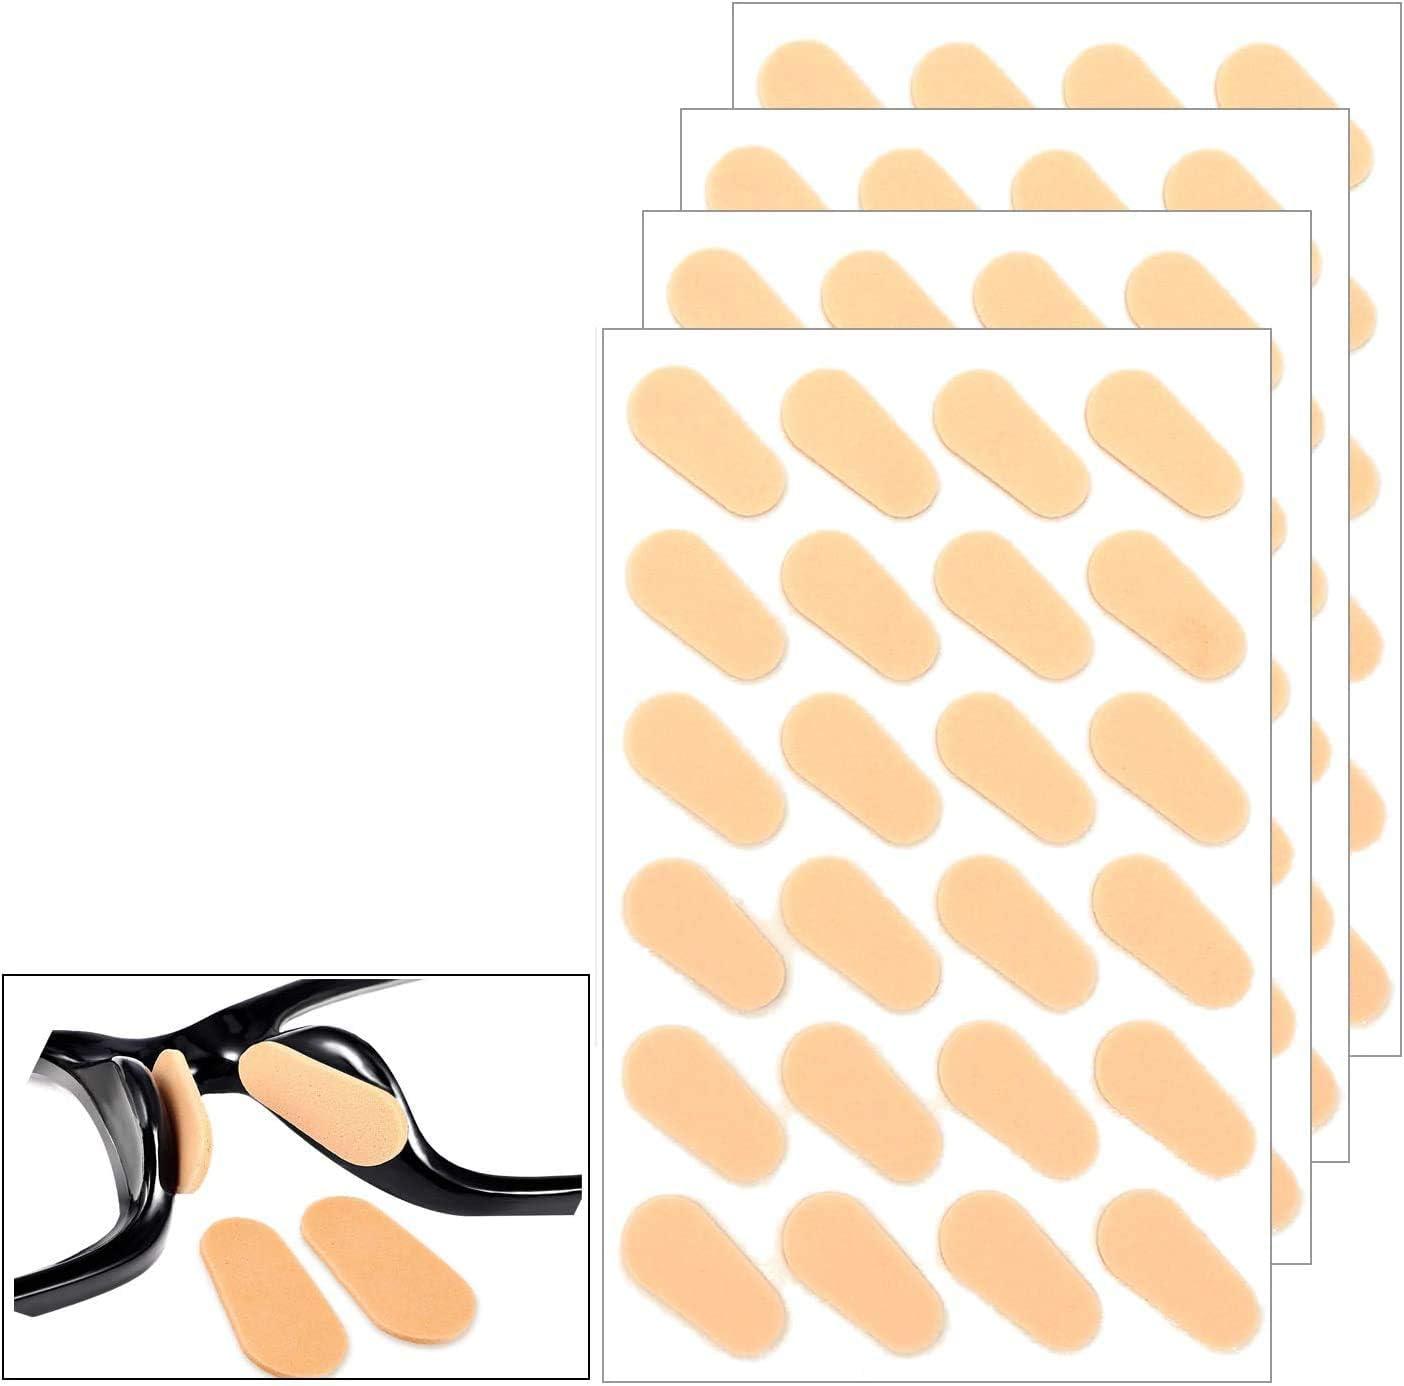 48 Pairs Soft Foam Nose Pads, Self-Adhesive Anti-Slip Eyeglass Nose Pads, Thin Nosepads for Eyeglasses Sunglasses Glasses